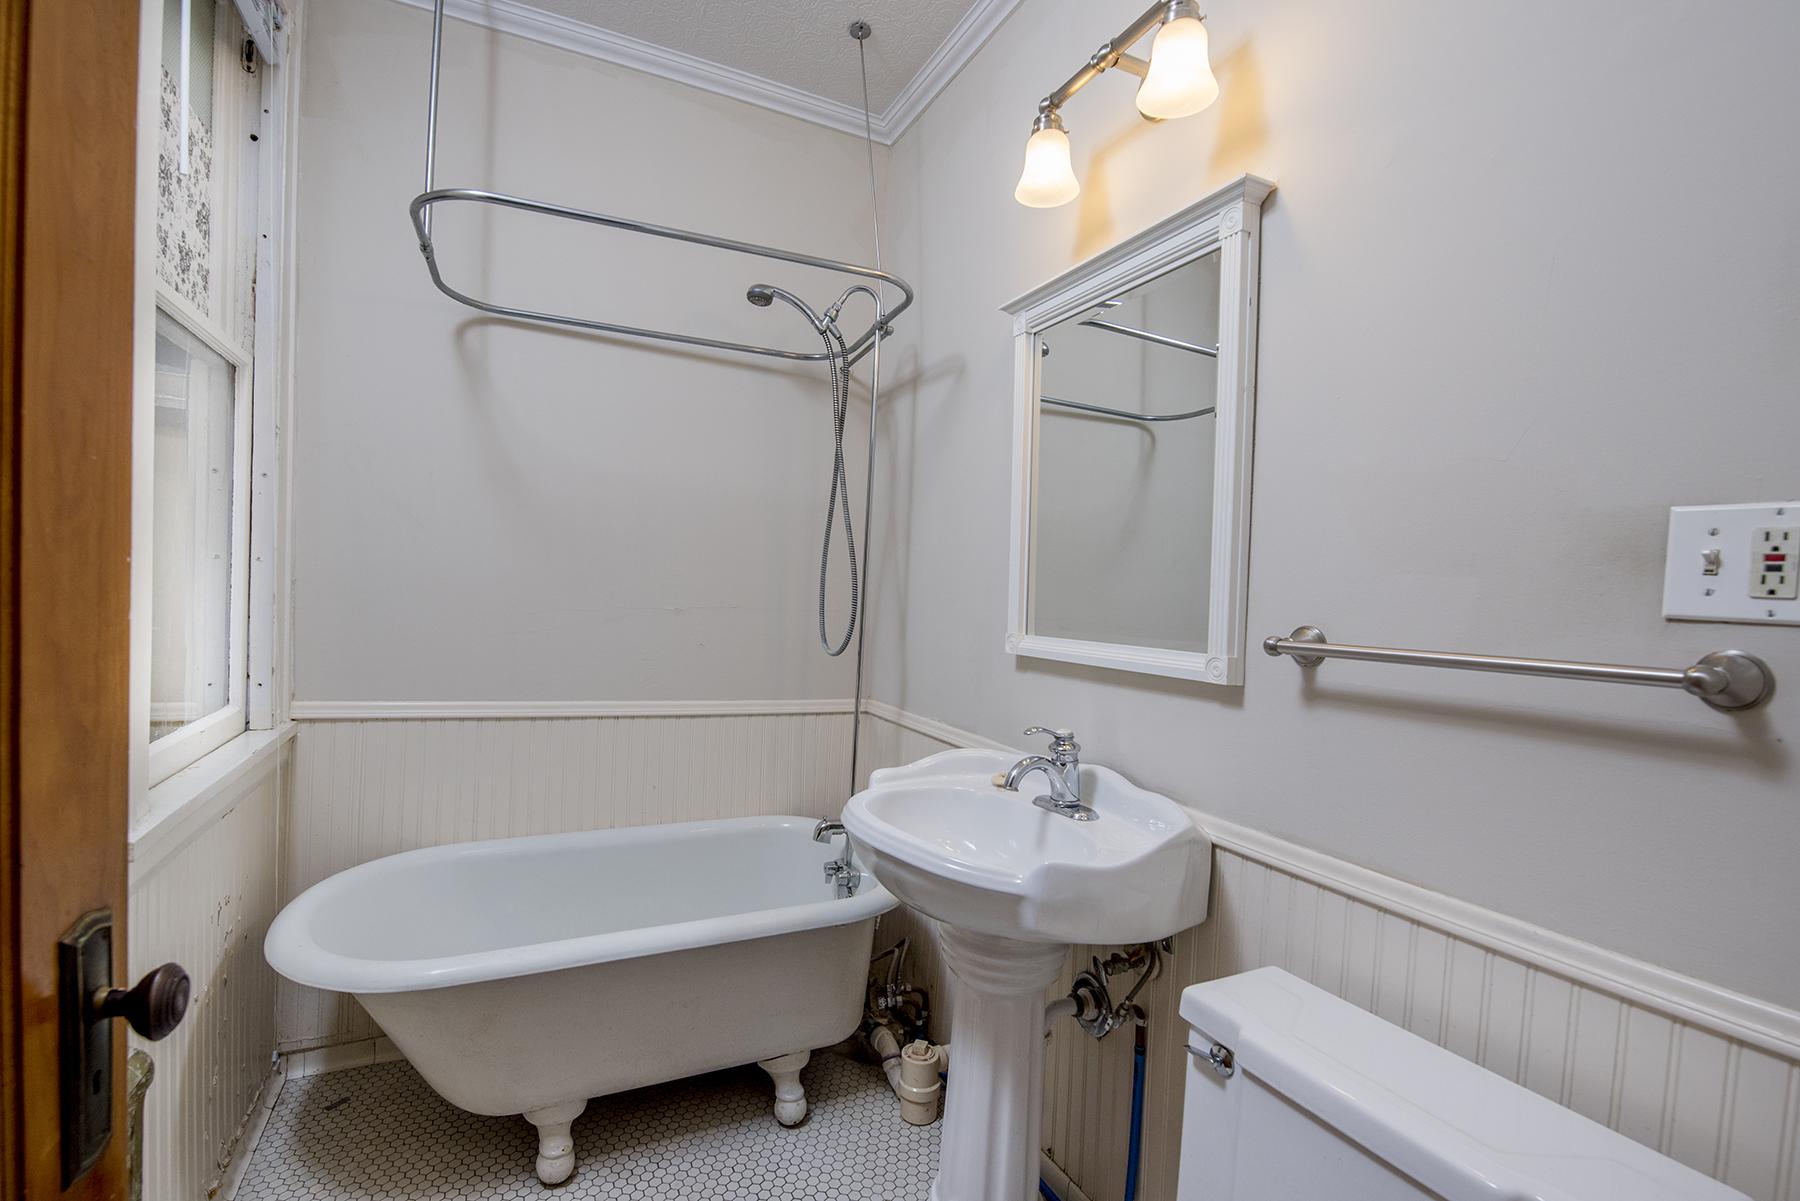 Full bathroom separates the 2 bedrooms.